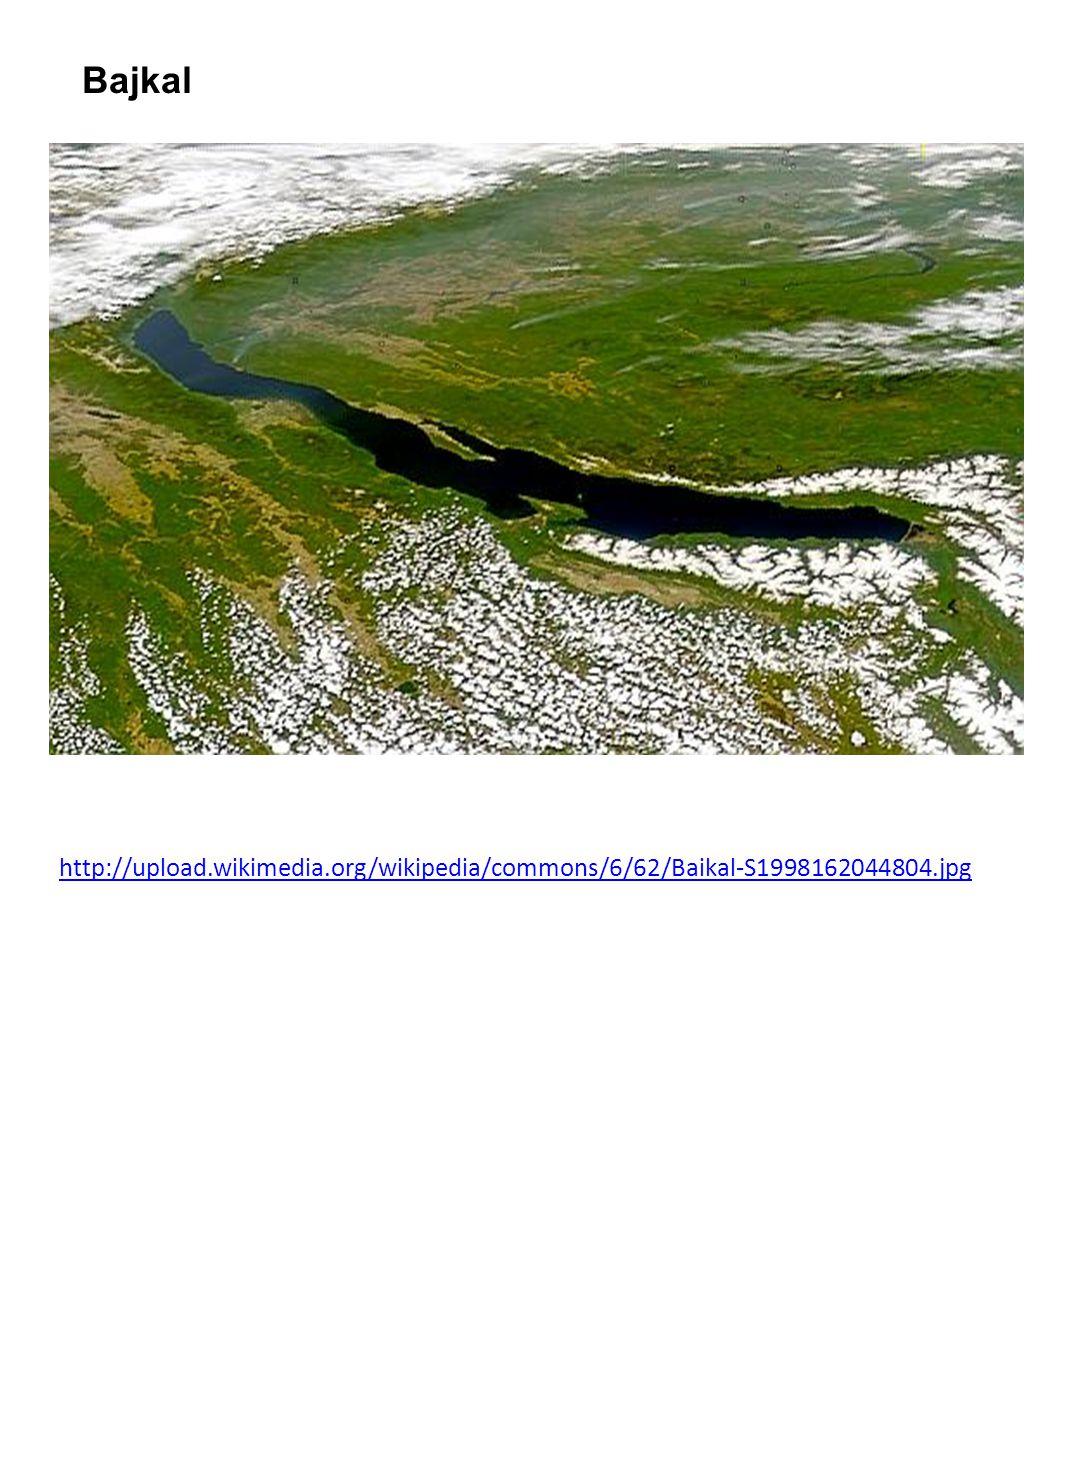 http://www.hofmann.estranky.cz/img/original/6768/tri_soutesky_mapa_umist.prehr ady.jpg Tři soutěsky